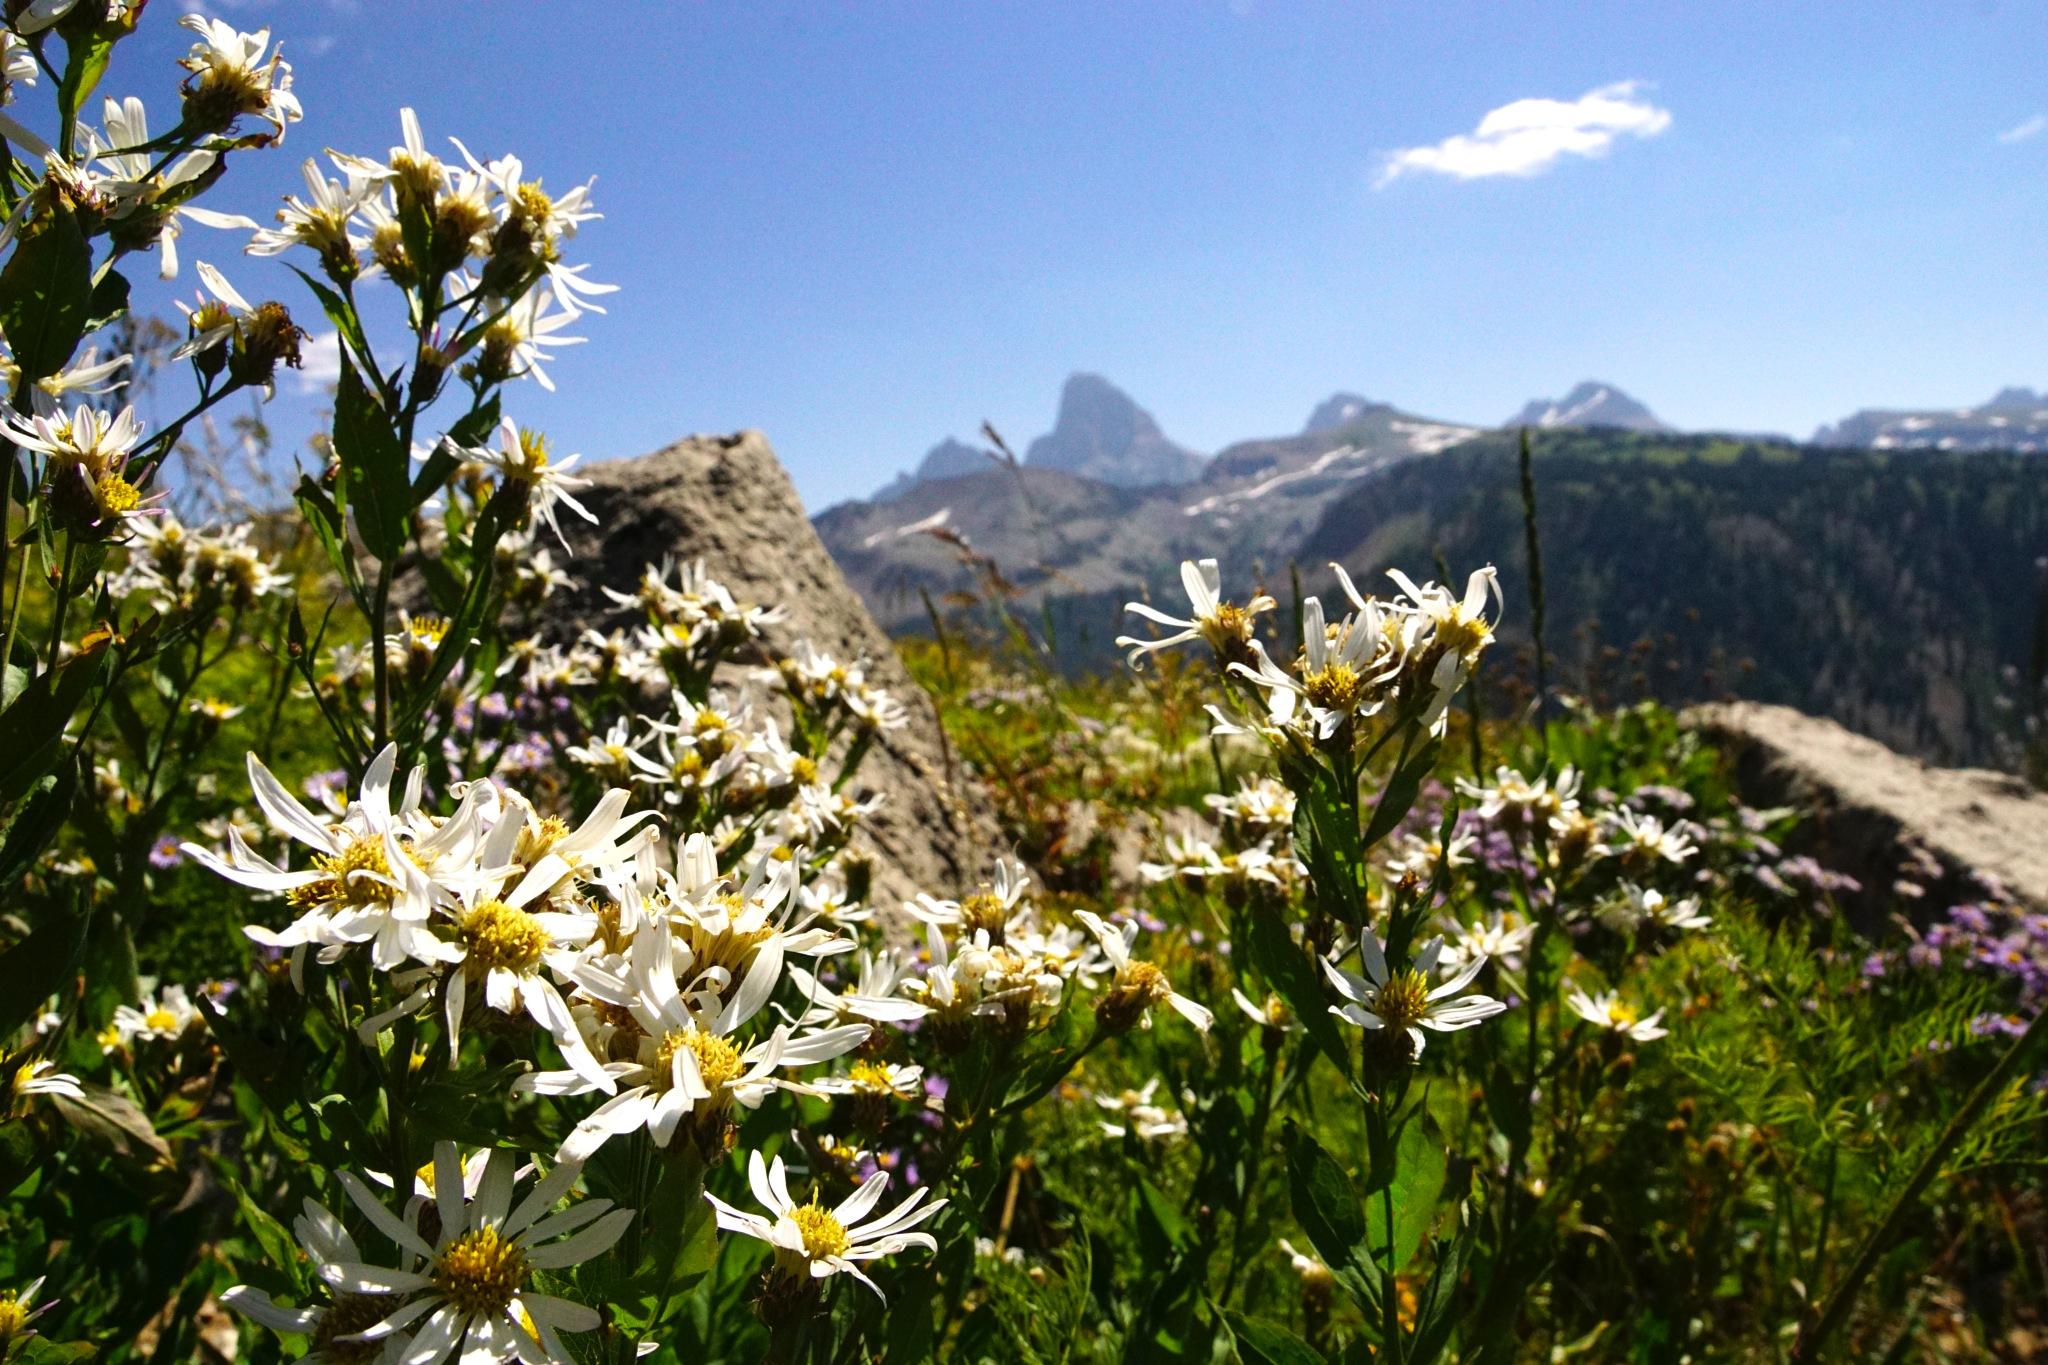 Daisy and the Teton by Joseph Heili